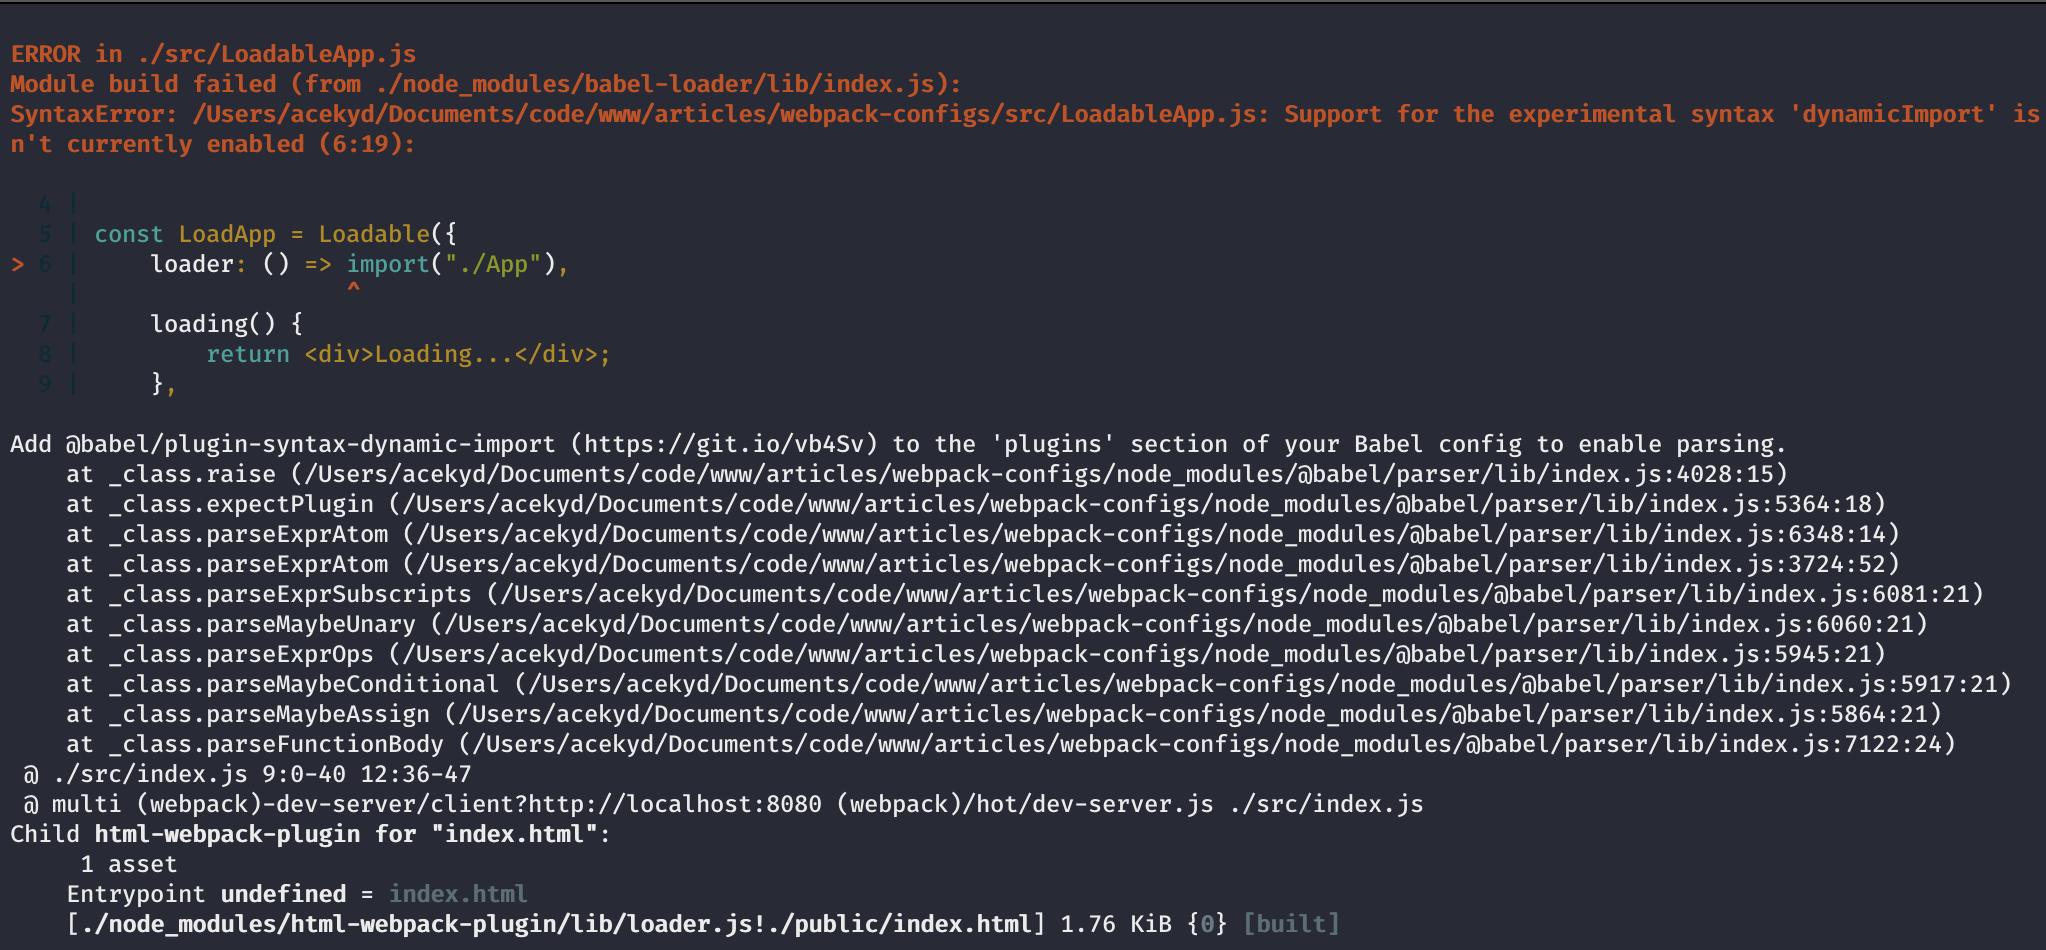 webpack-react-babel-dynamoc-import